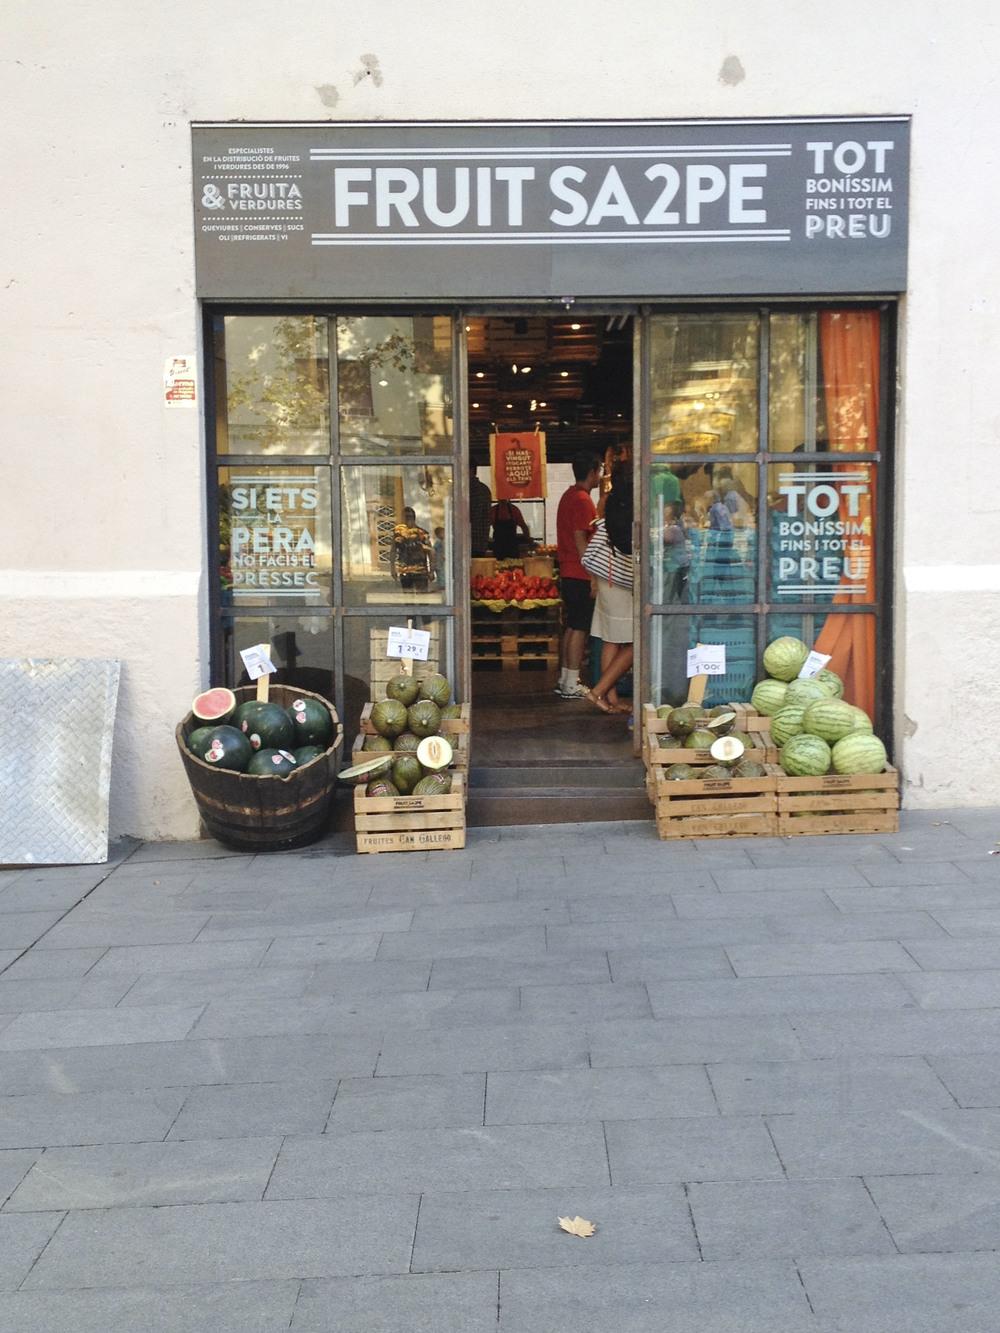 fruita 6 verdures barcelona gracia2029.jpg